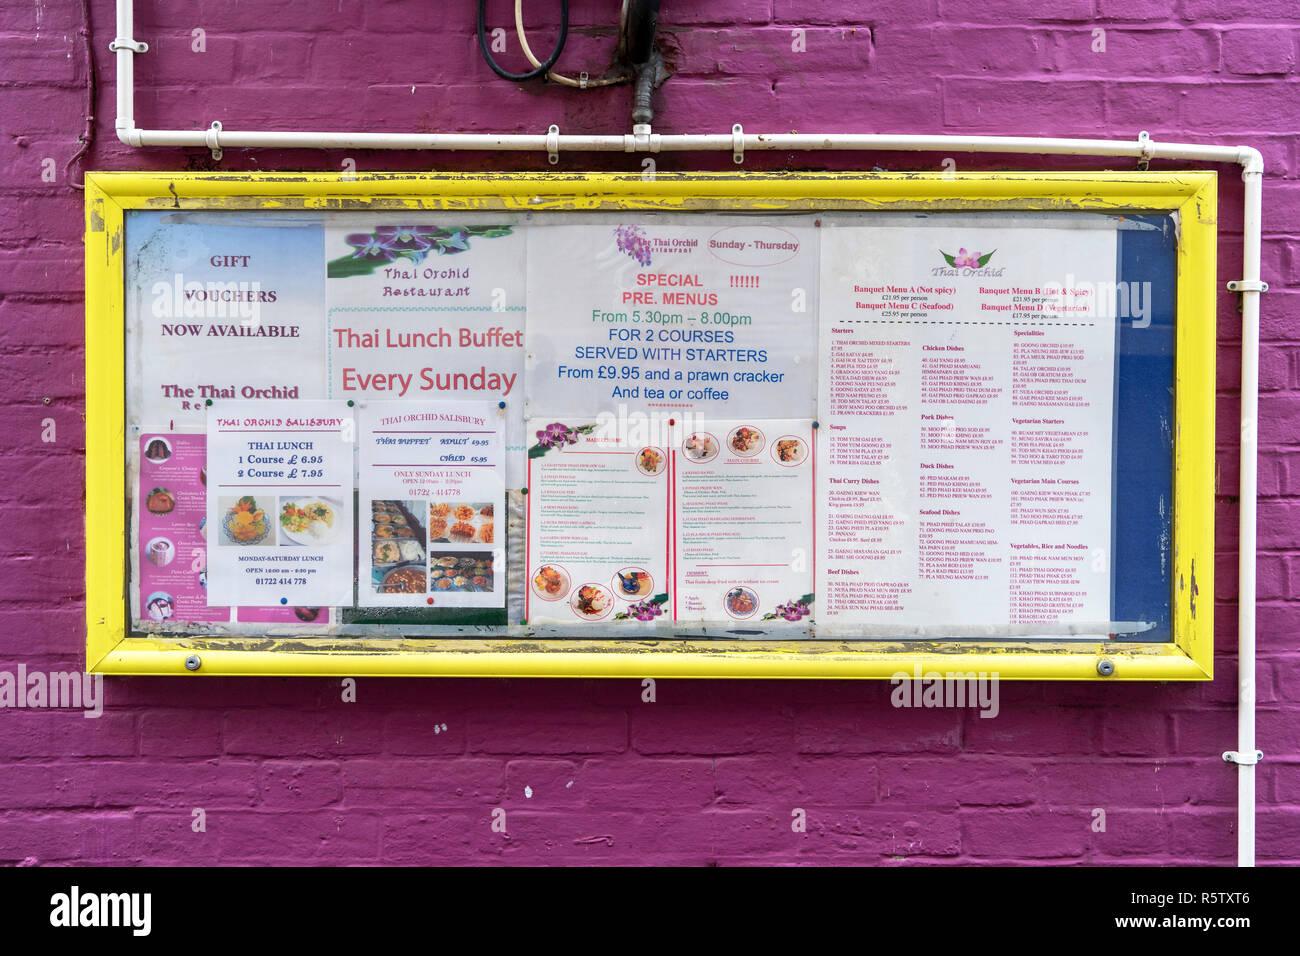 Thai restaurant menus board in yellow frame on purple wall - Stock Image